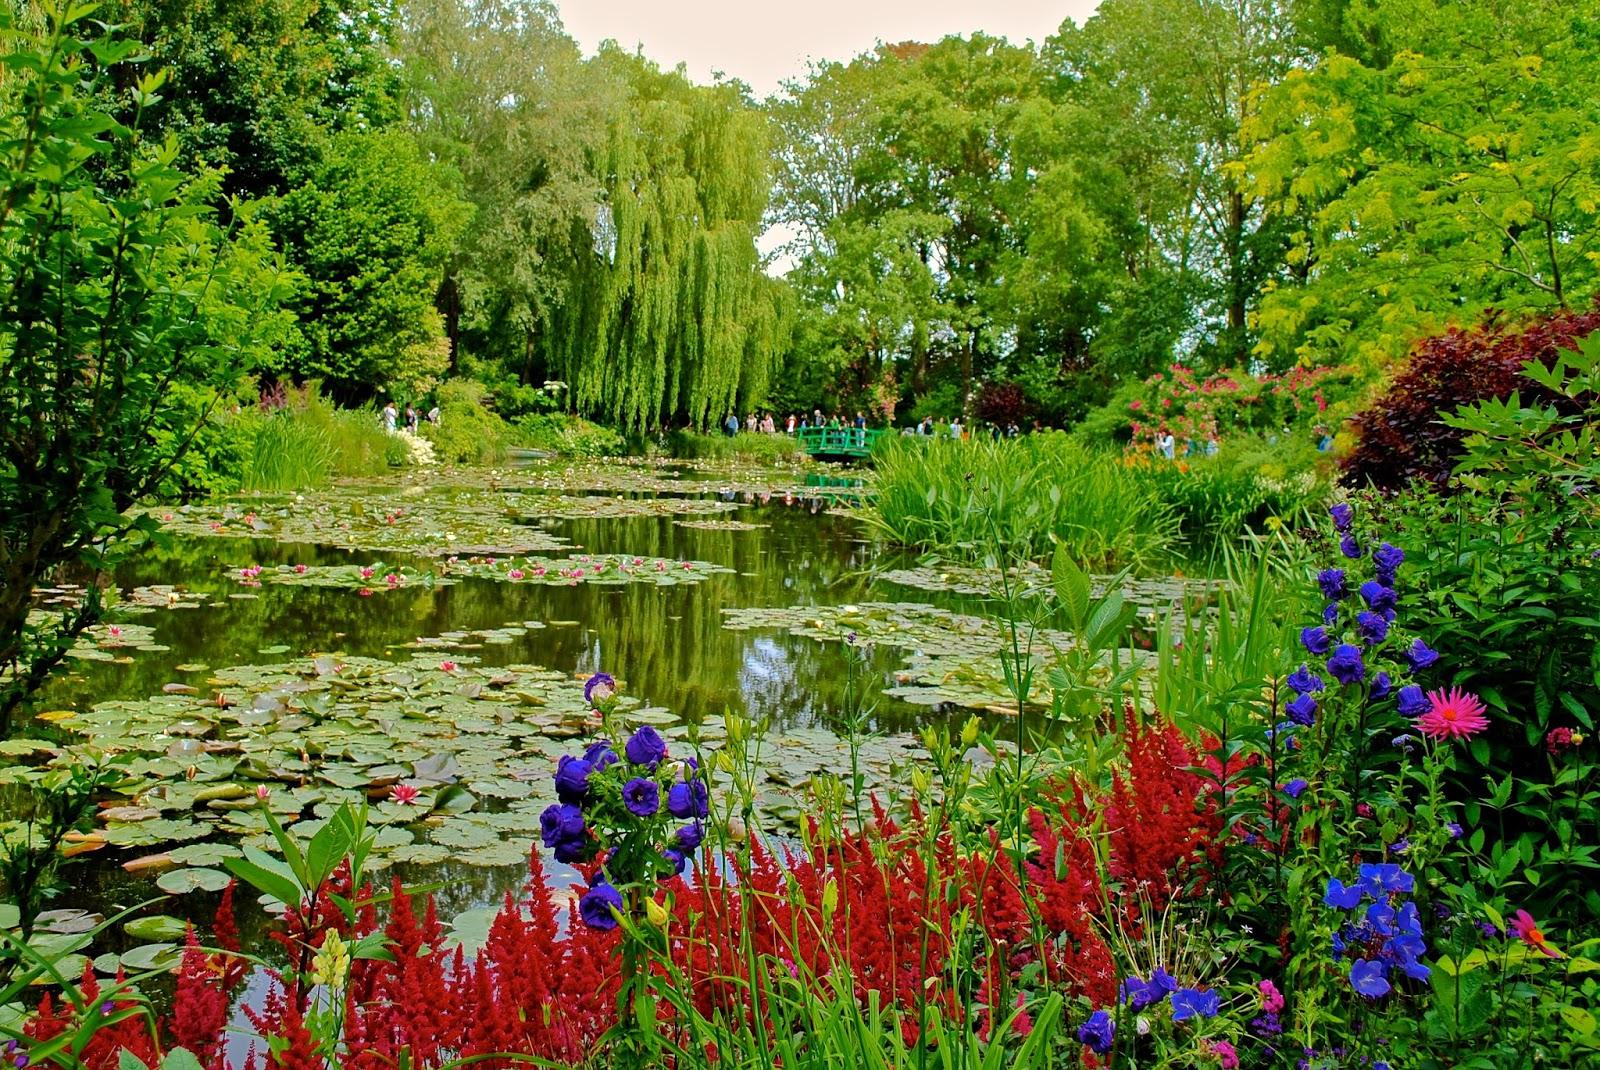 Monet's Garden Waterlilies with Japanese Bridge